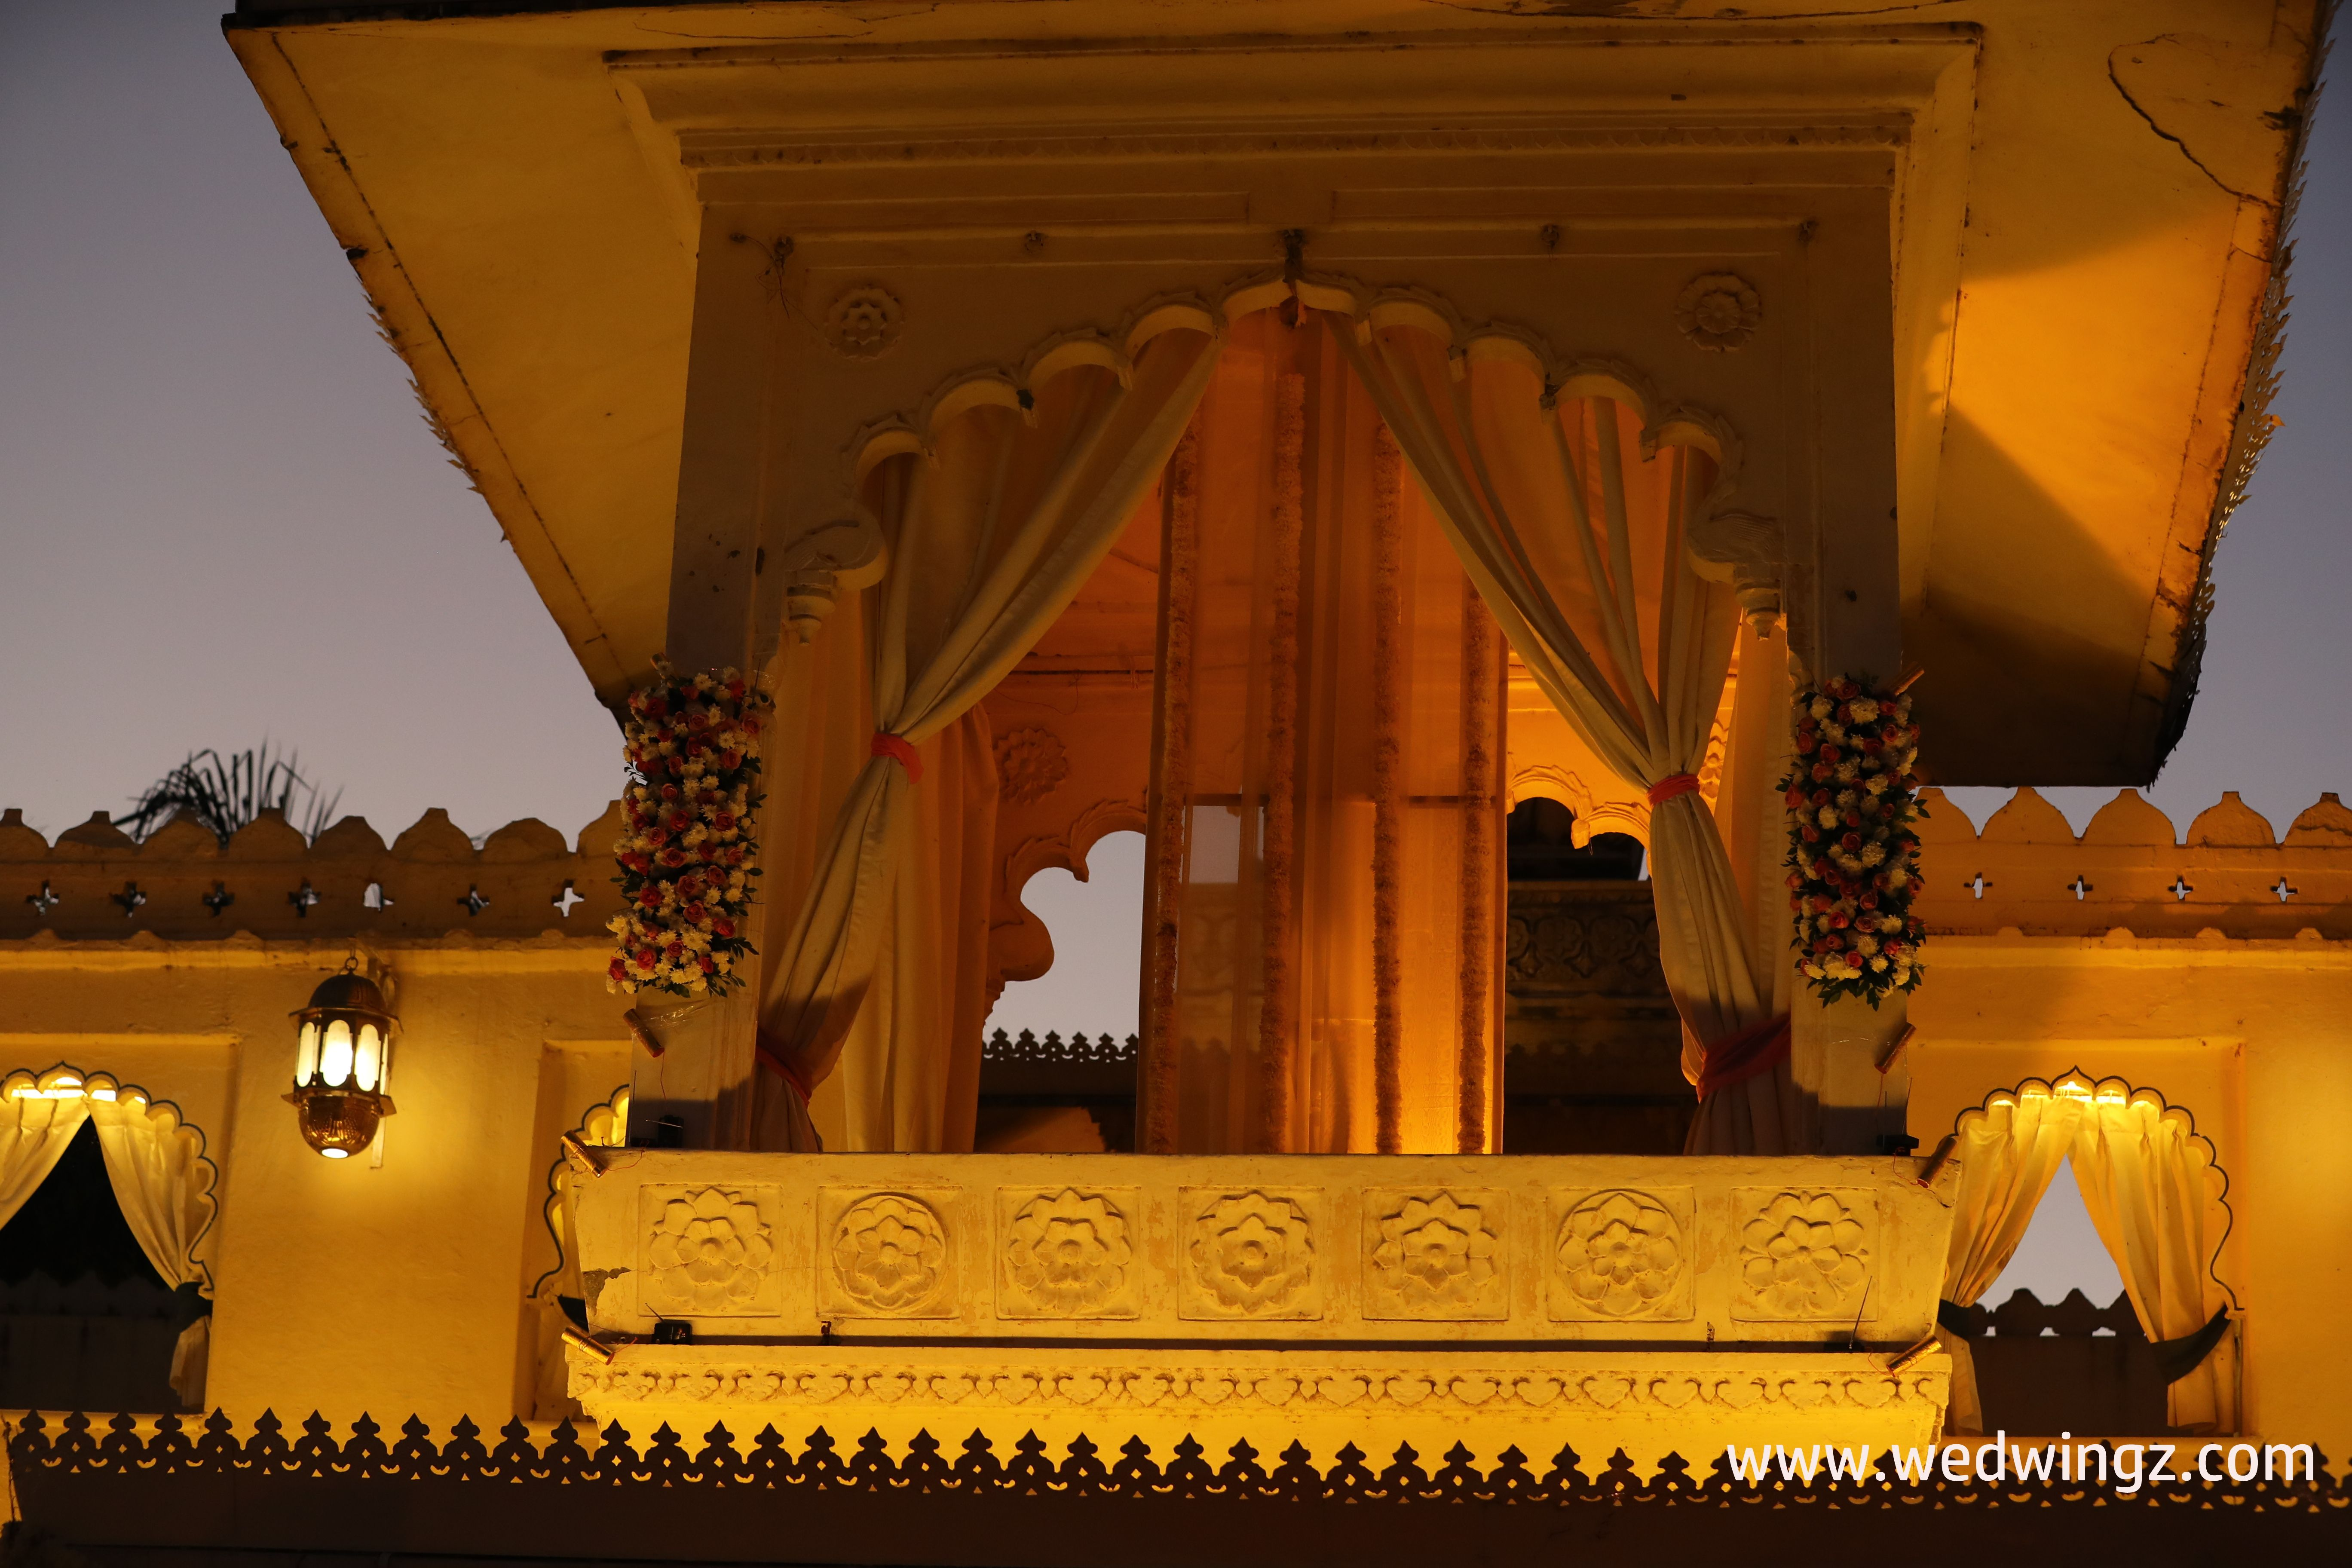 Wedding decor at Jagmandir Island Palace Udaipur